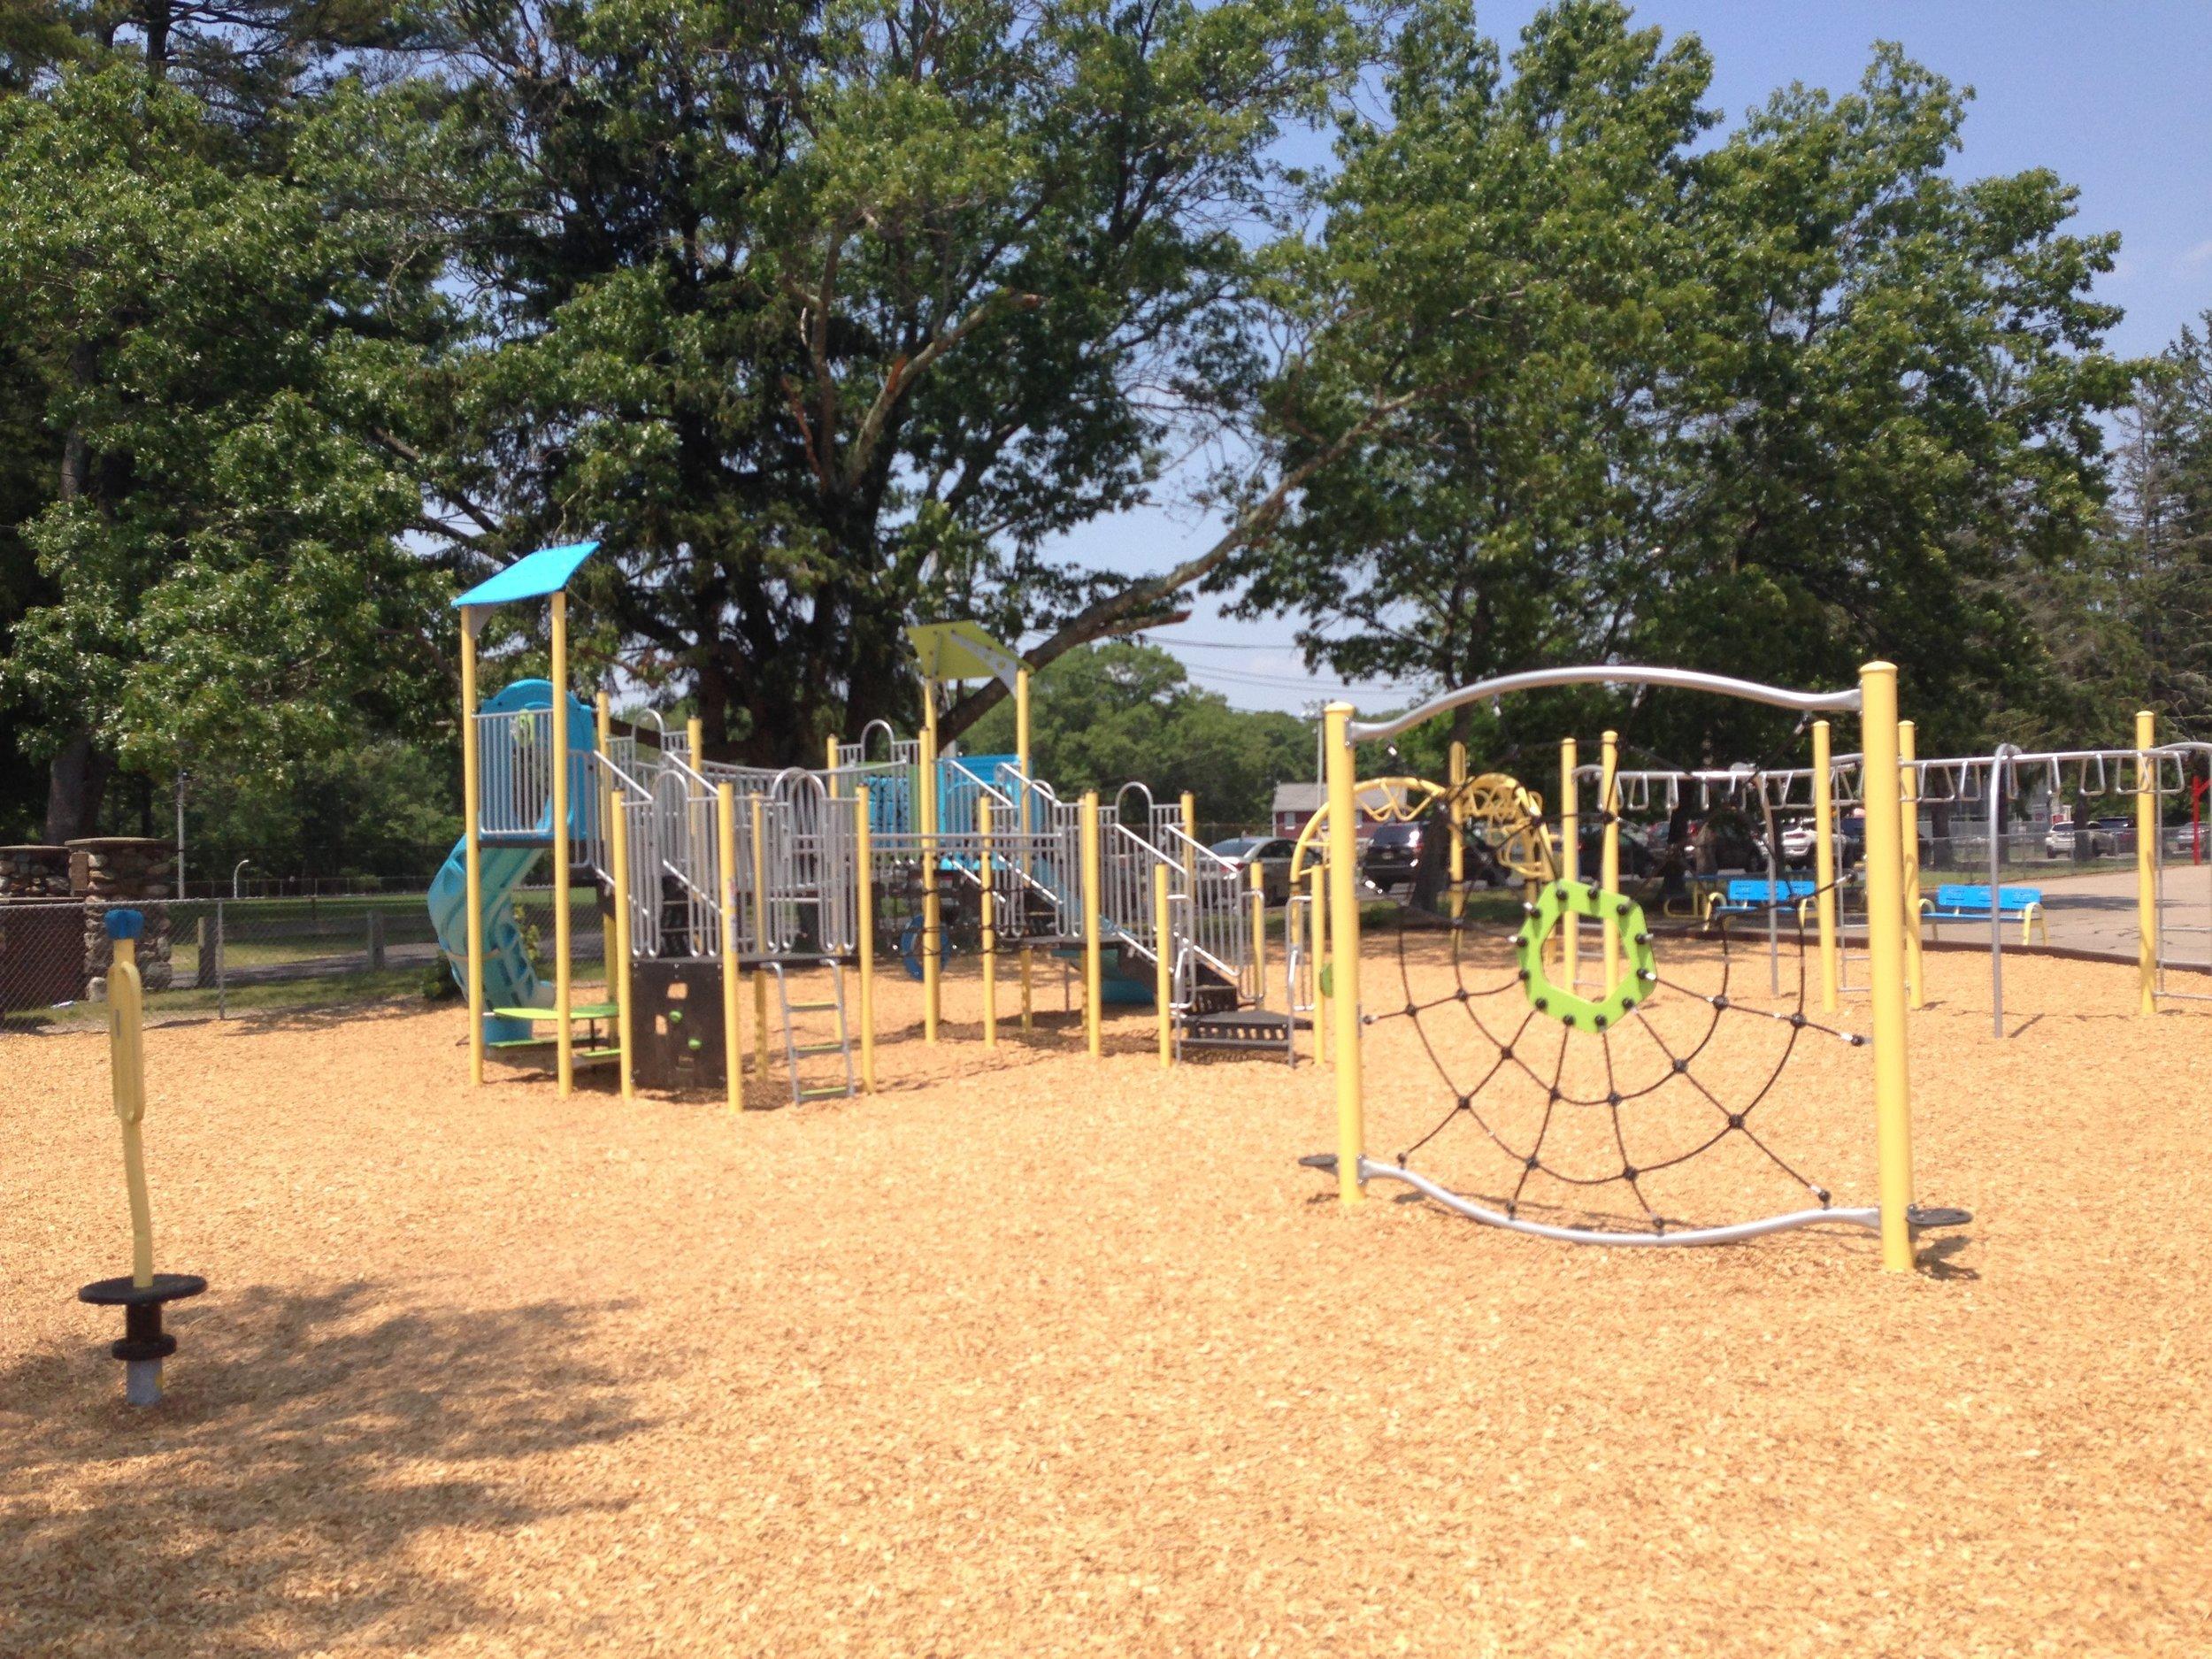 Falls School Playground in North Attleborough, MA.jpg